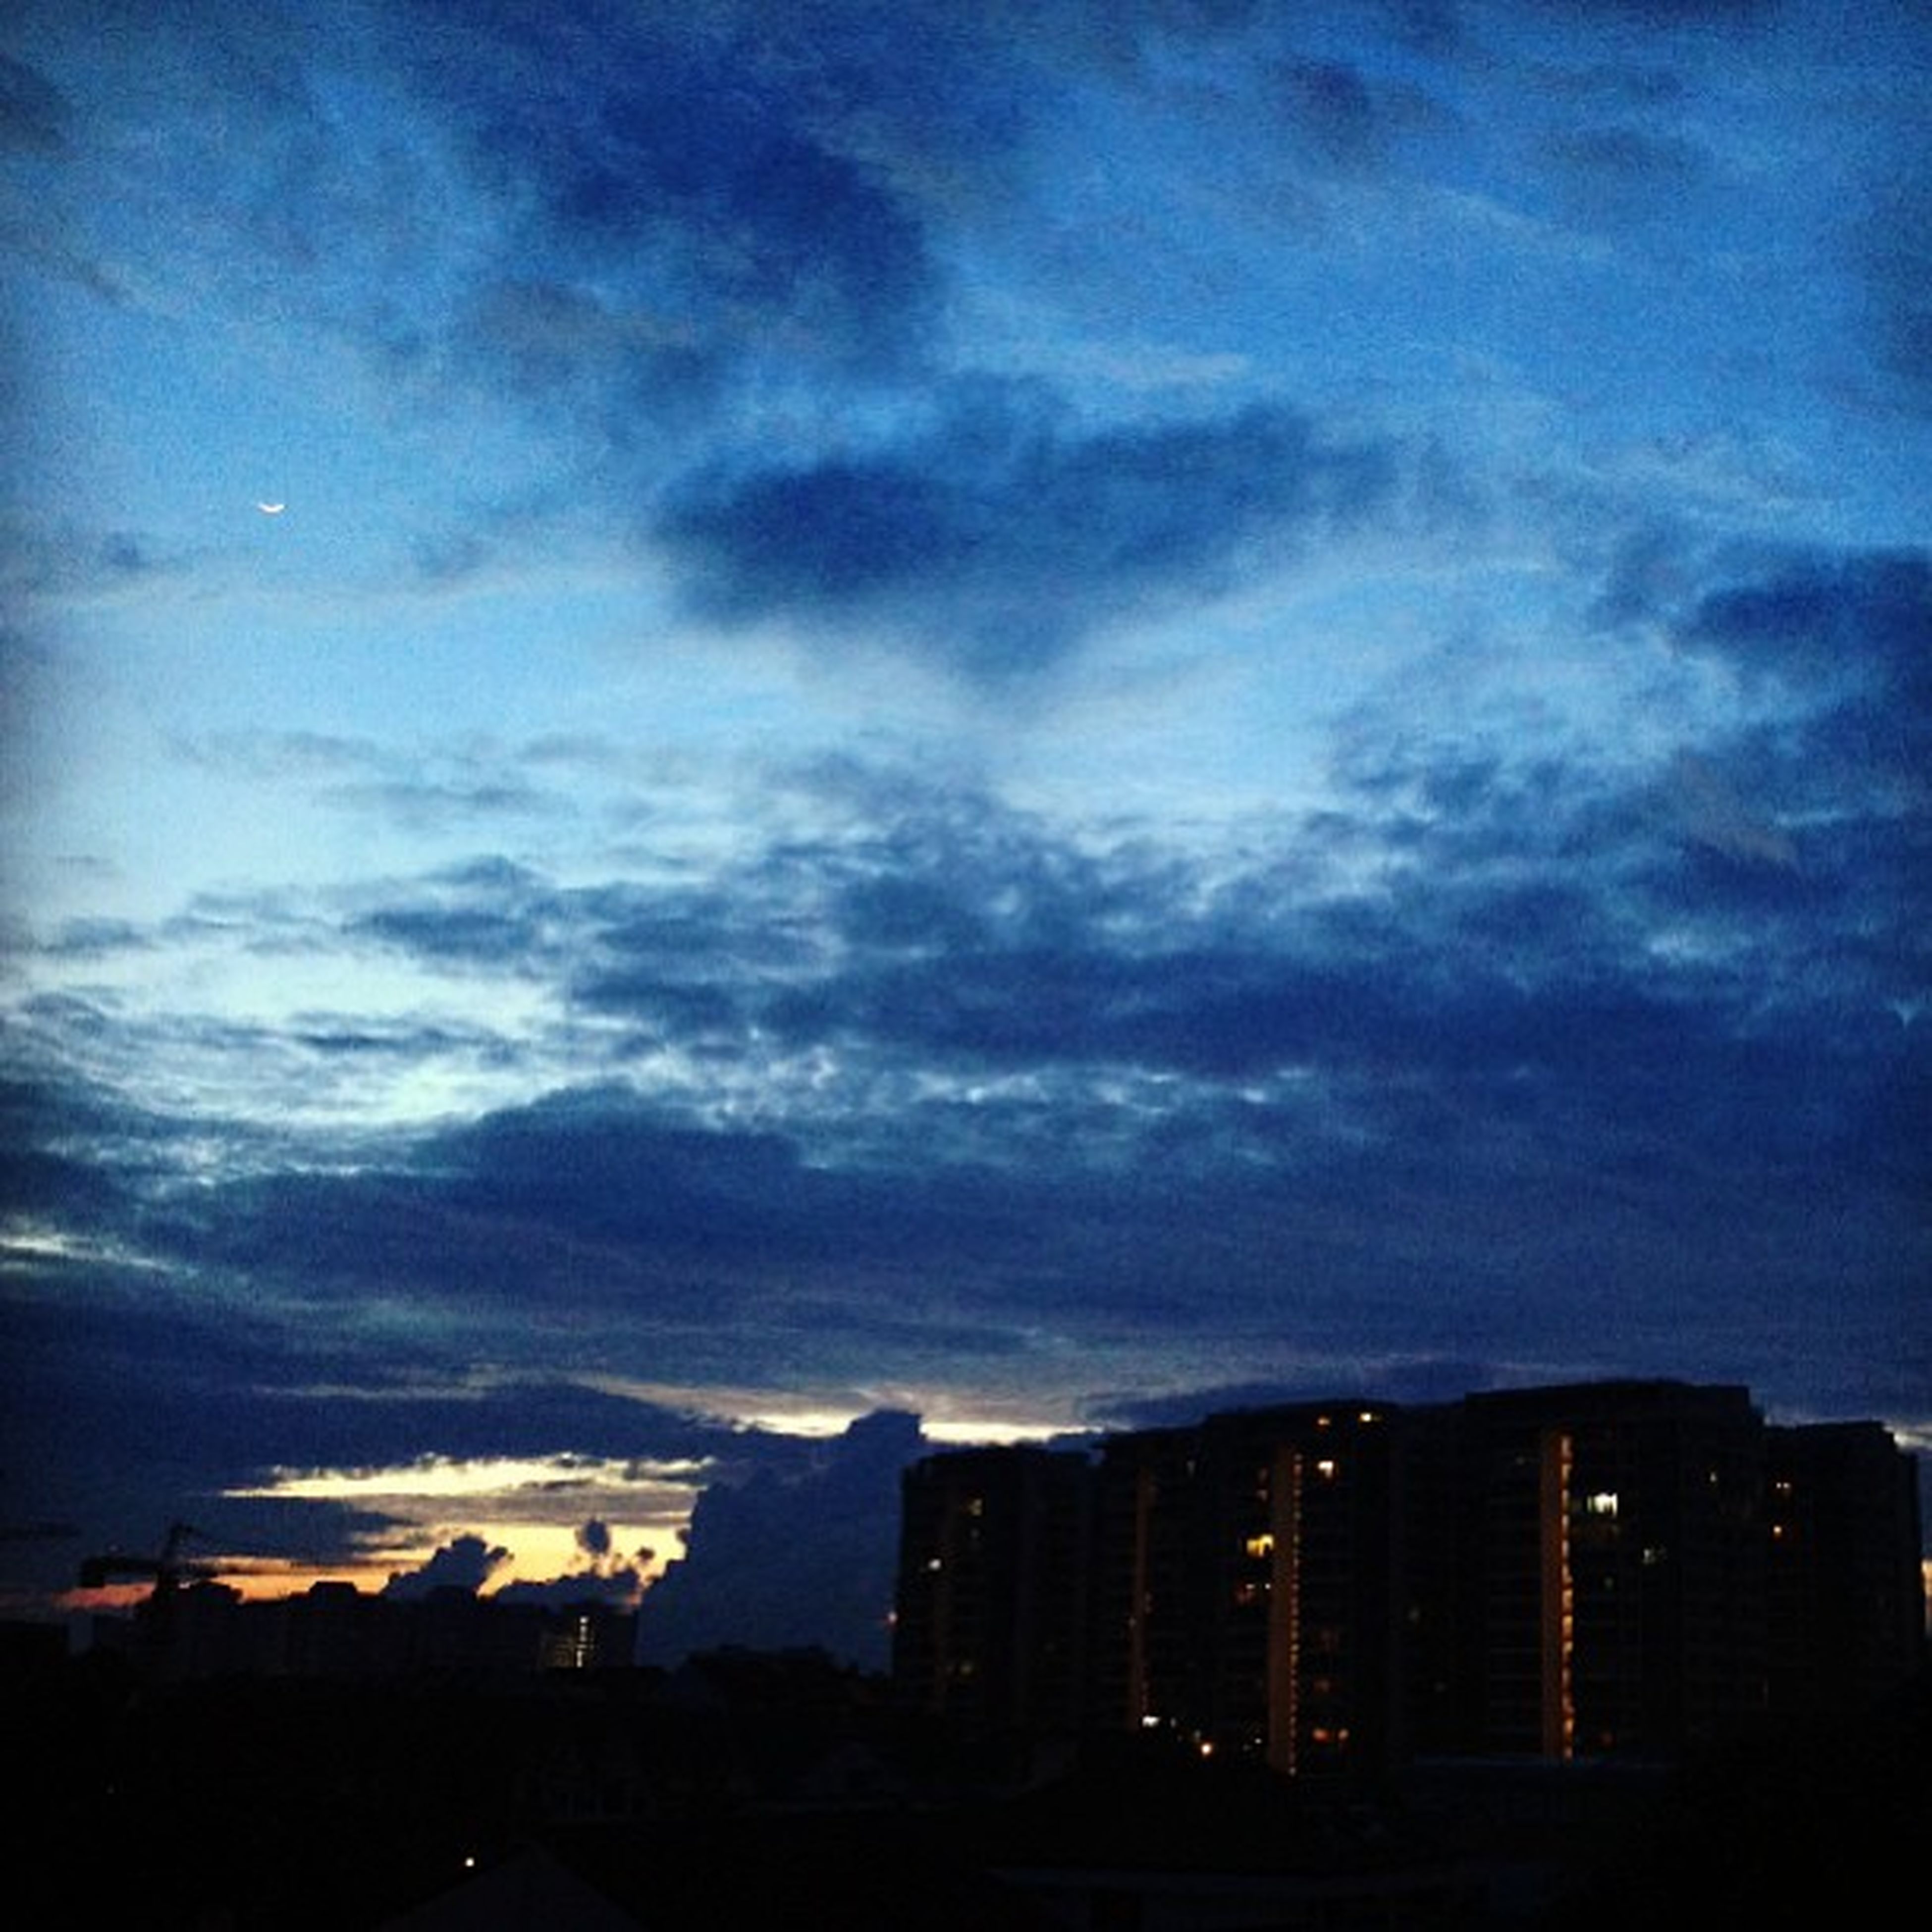 building exterior, architecture, built structure, sky, city, cloud - sky, cityscape, silhouette, cloudy, sunset, dusk, cloud, residential building, residential structure, weather, residential district, dramatic sky, outdoors, house, nature